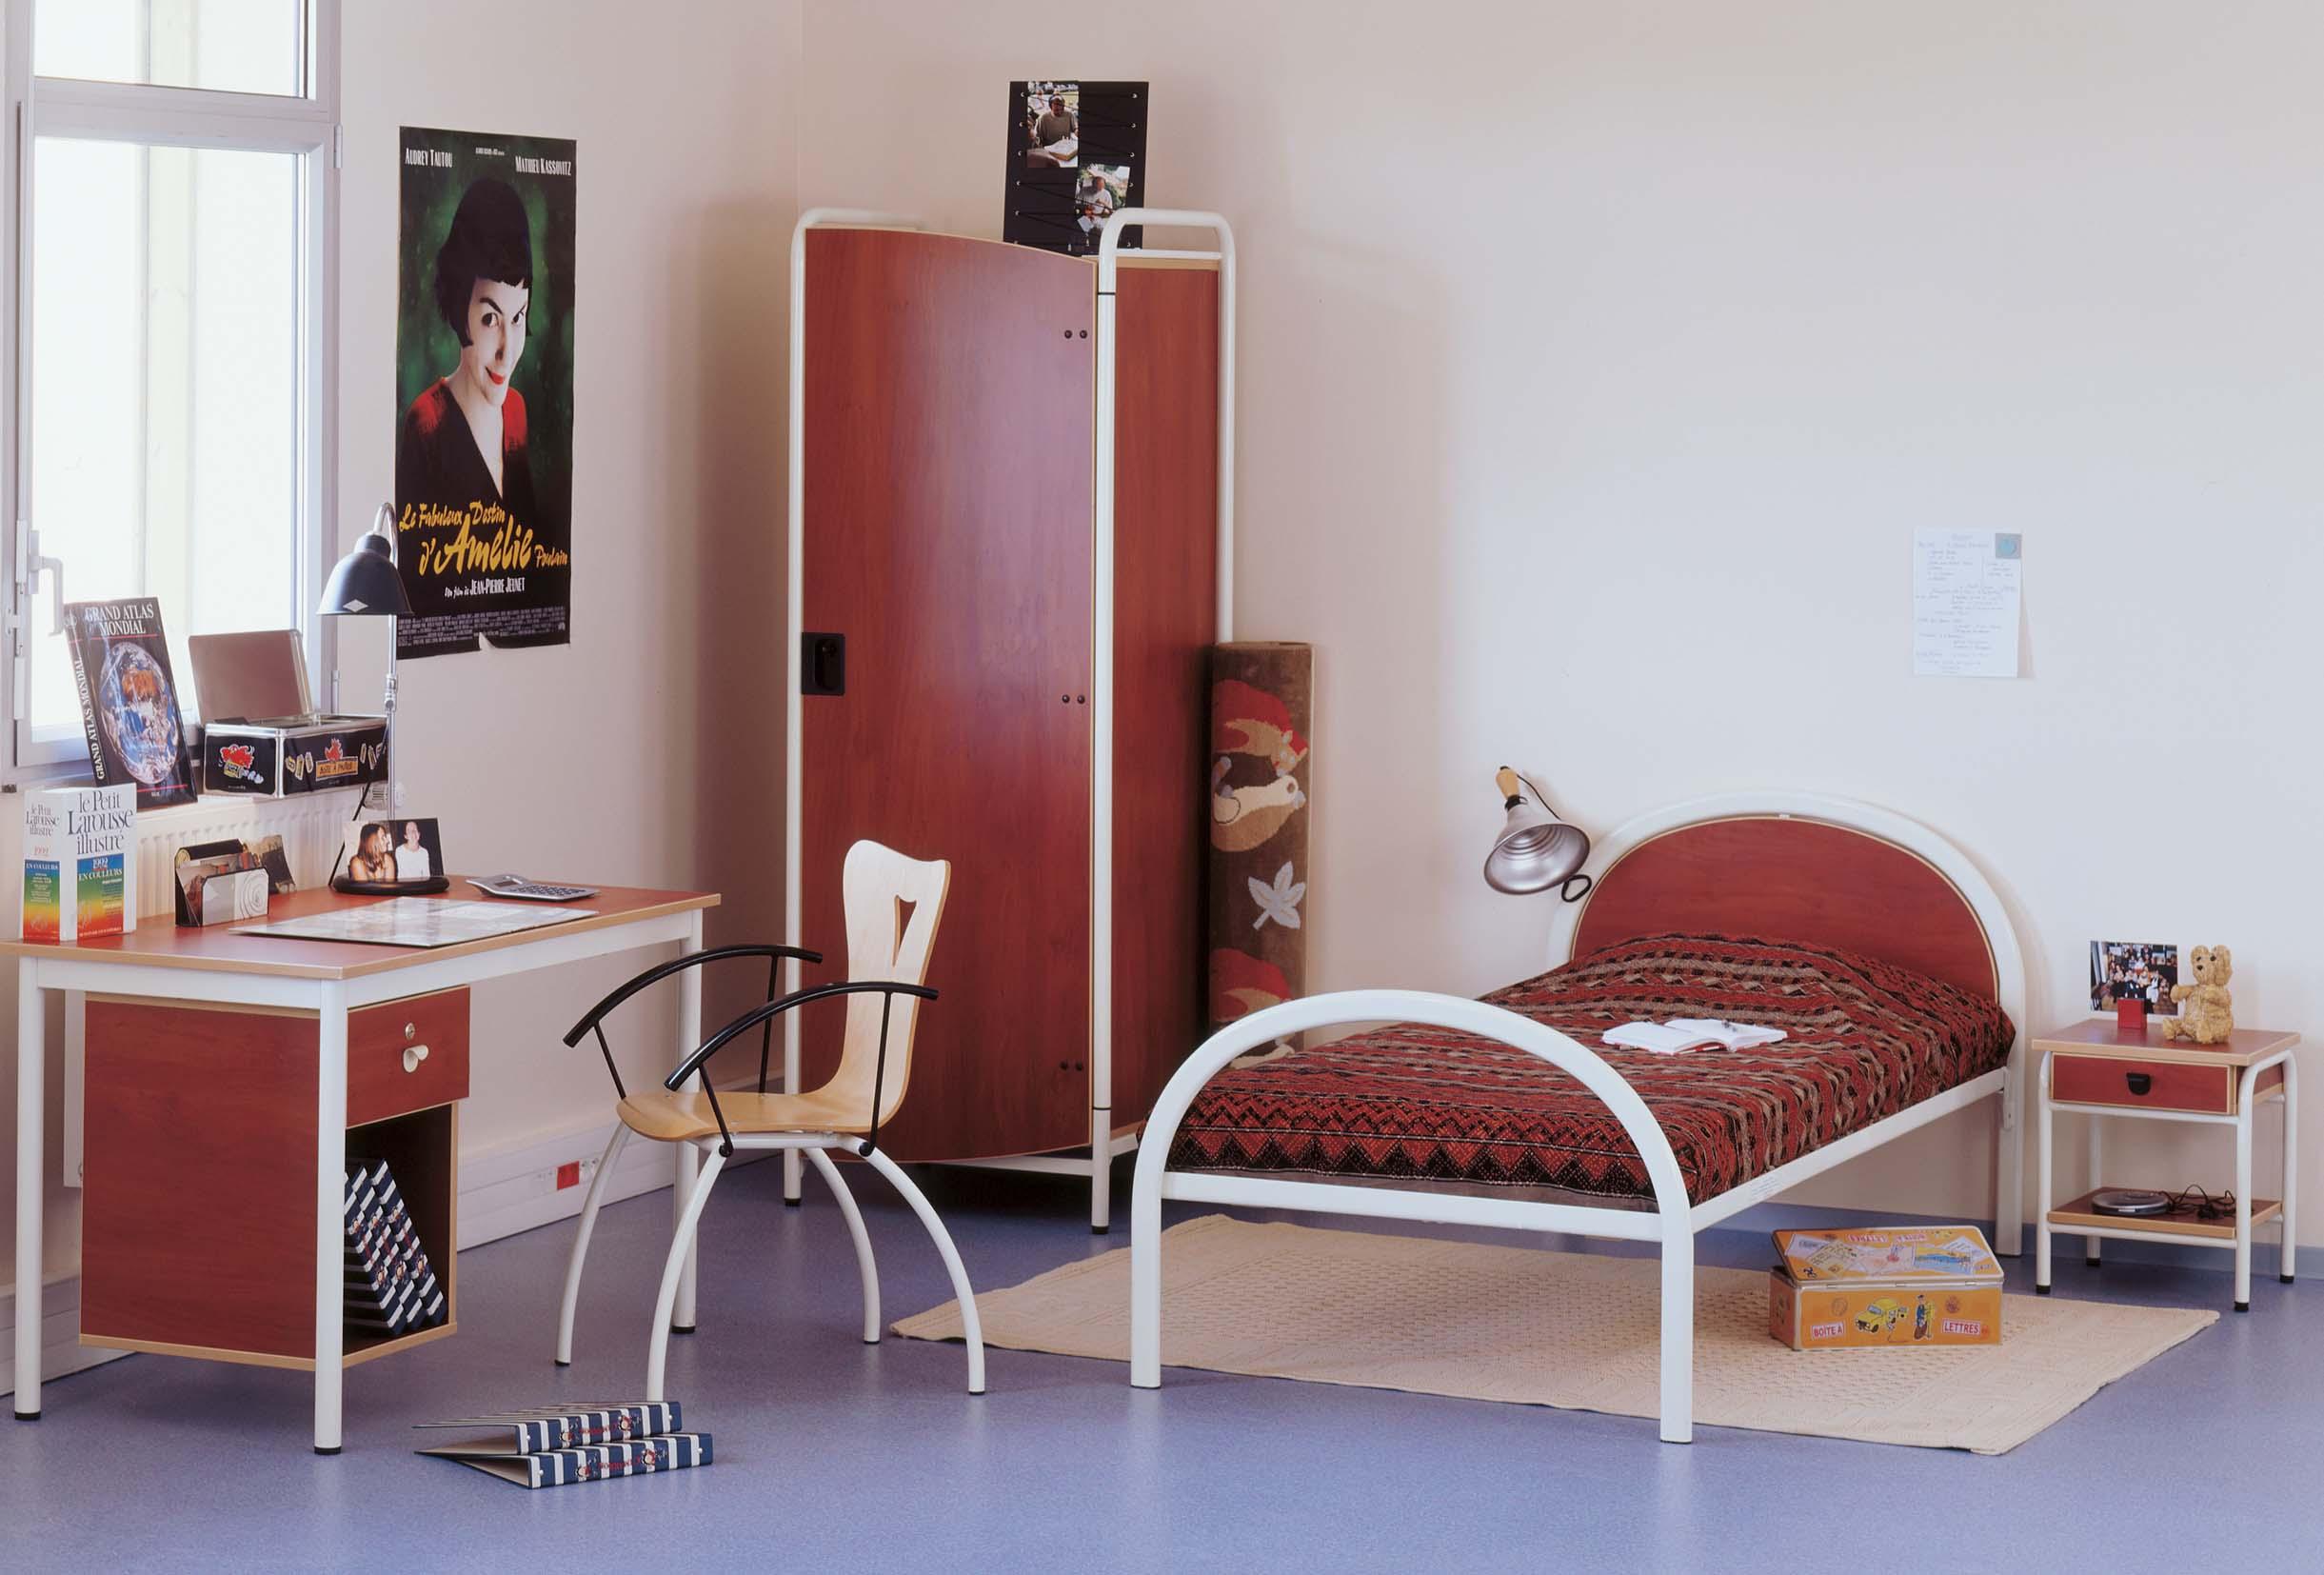 h bergement mobilier de collectivit s mobilier goz. Black Bedroom Furniture Sets. Home Design Ideas